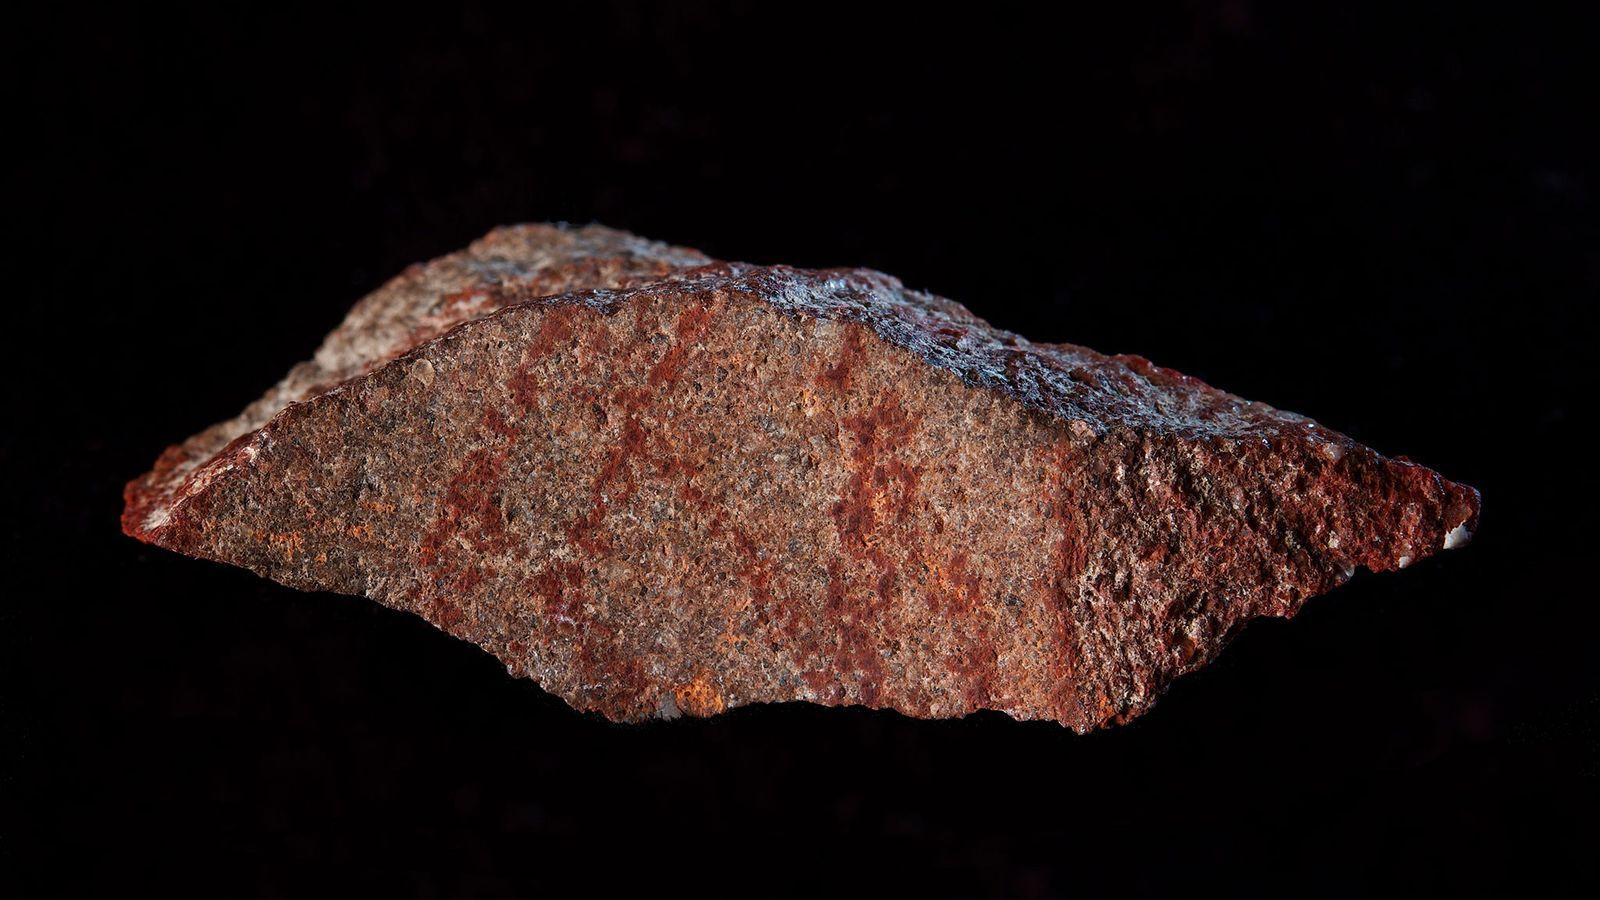 Esta lasca de rocha marcada de ocre foi descoberta na Caverna Blombos, na África do Sul.